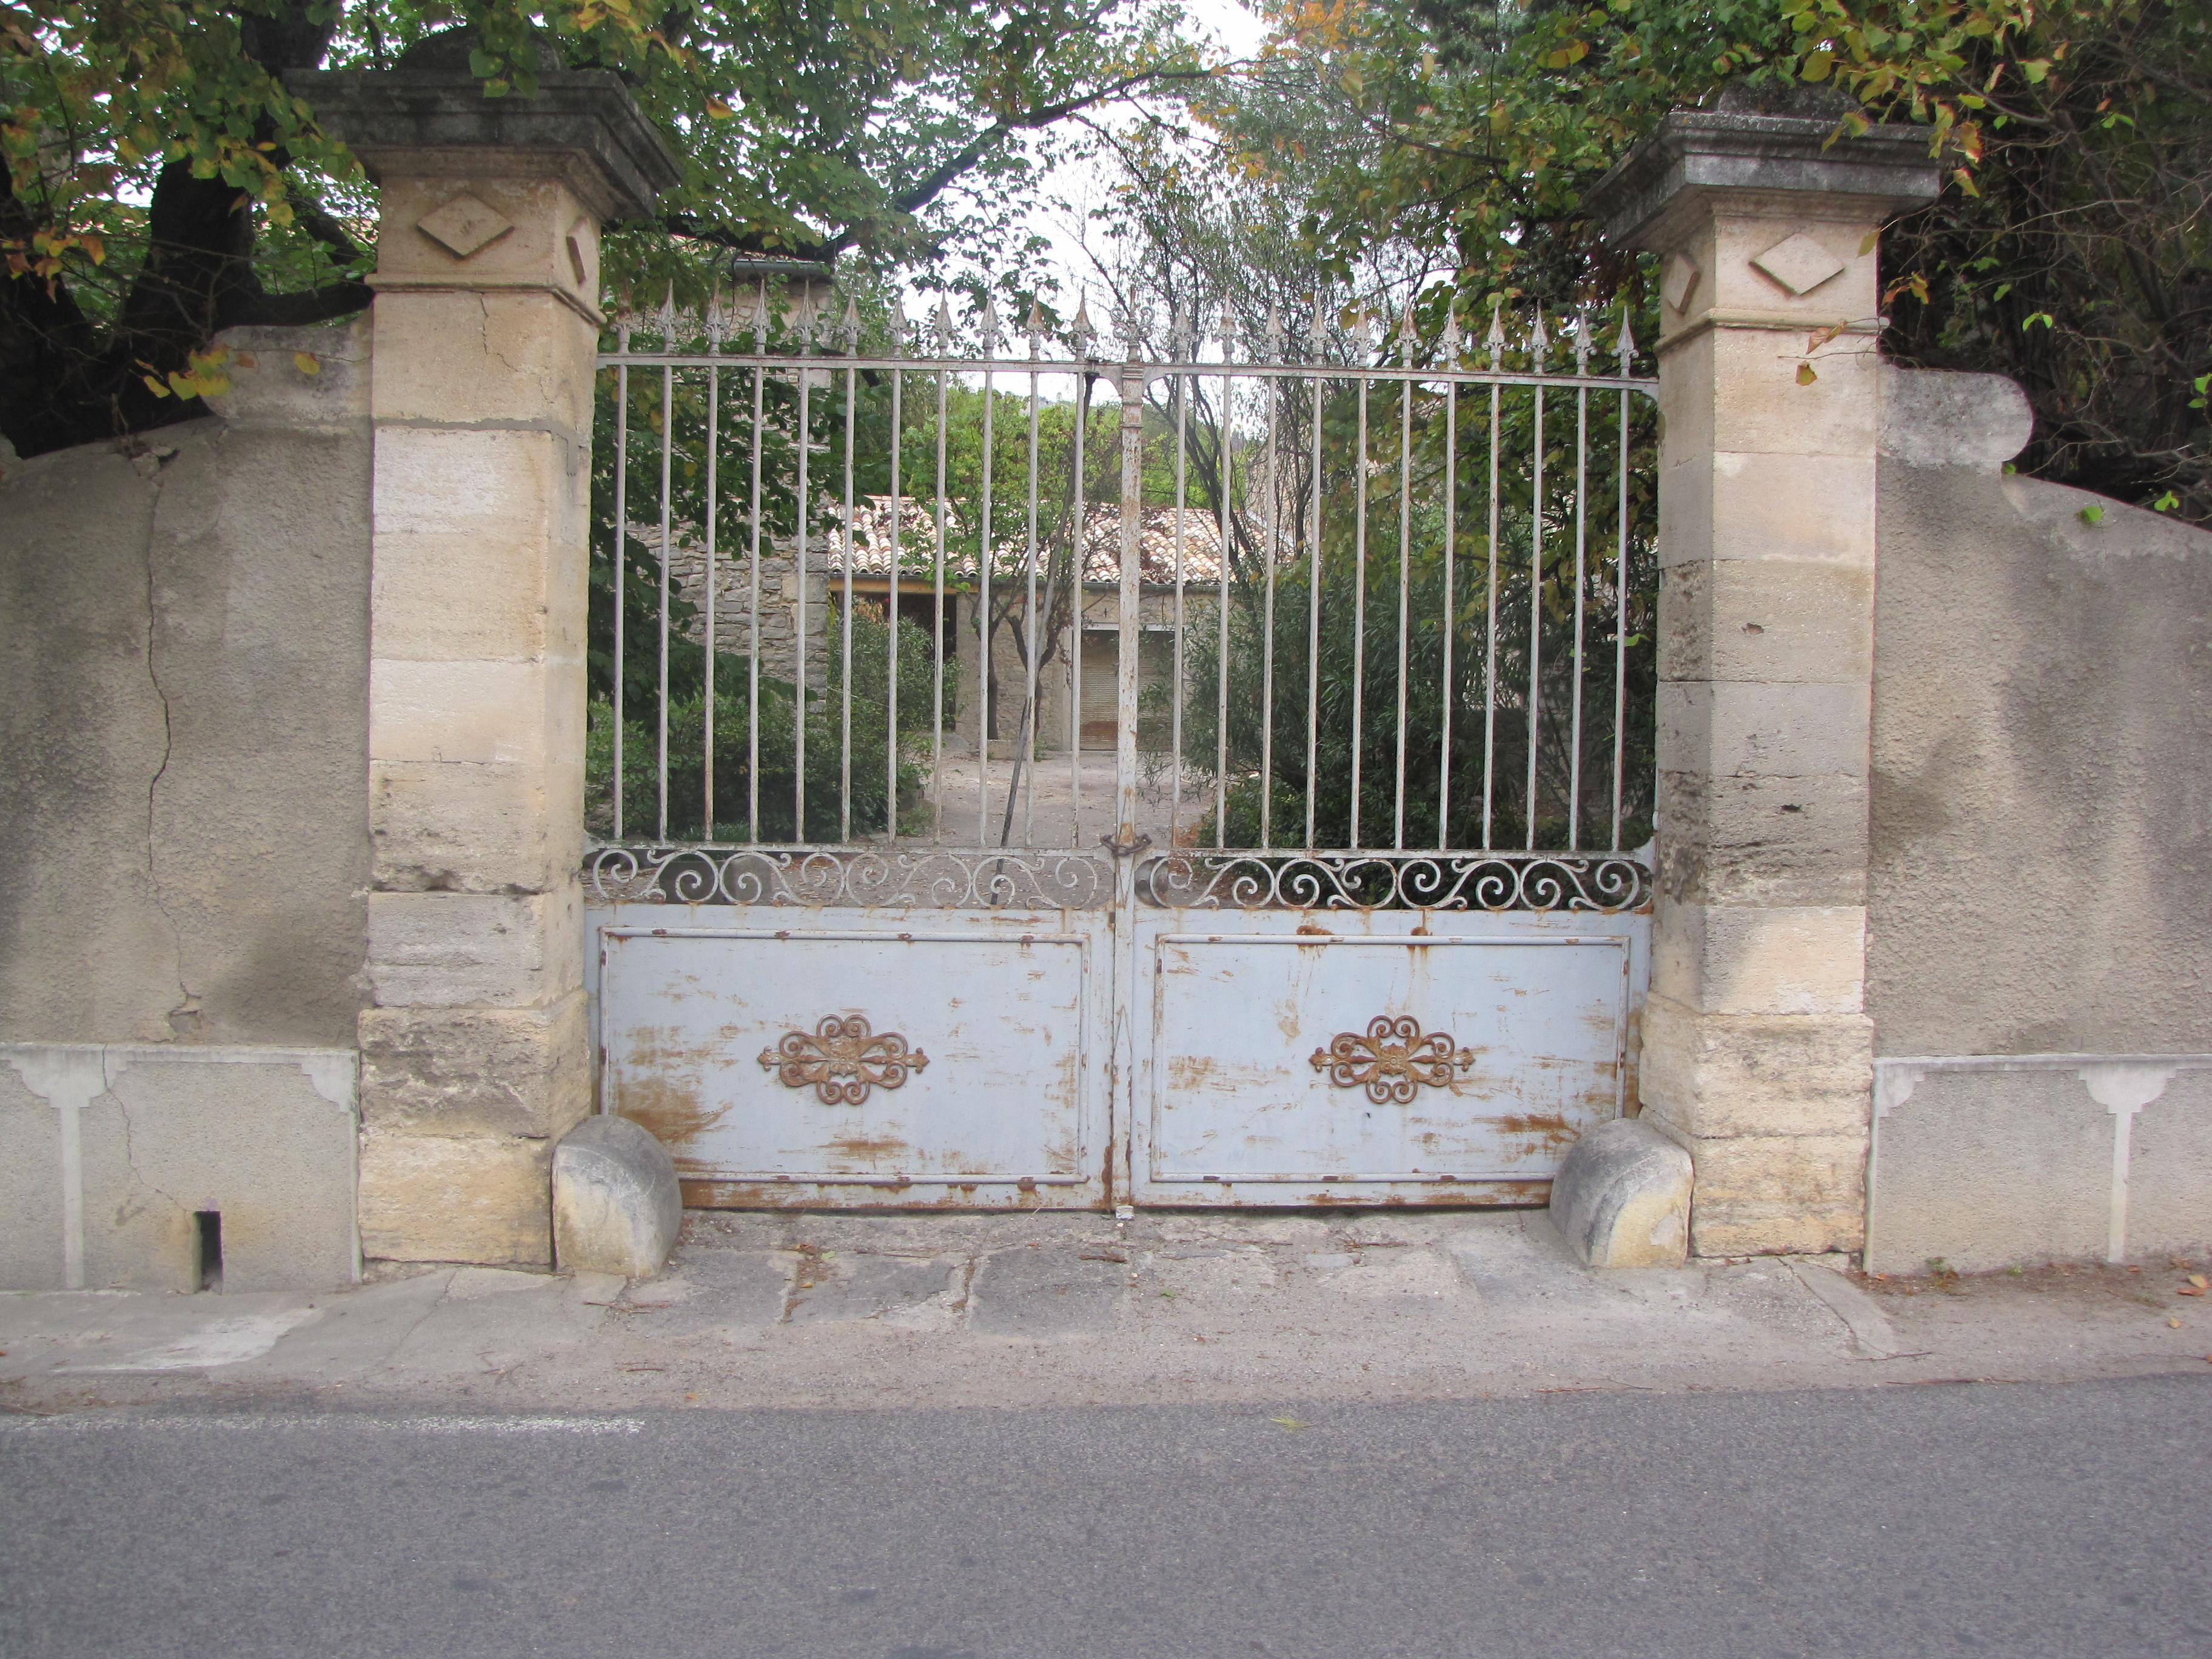 Desportes Rénovation Gard. Piliers d'un portail à restaurer